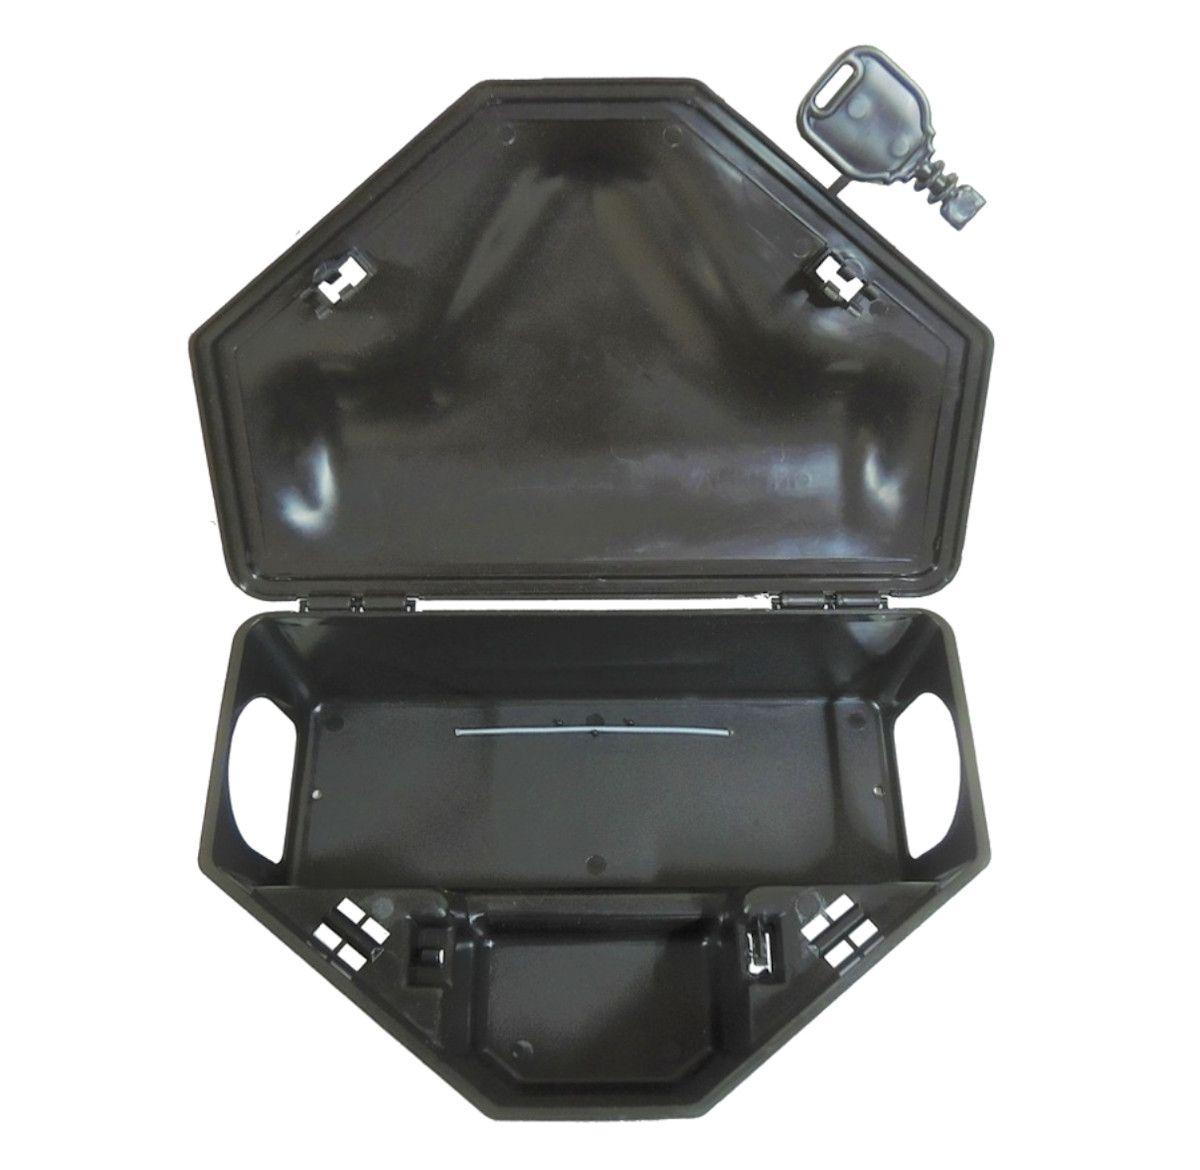 Kit 3 Porta Isca Com Chave + 3 Saches De Uso Profissional